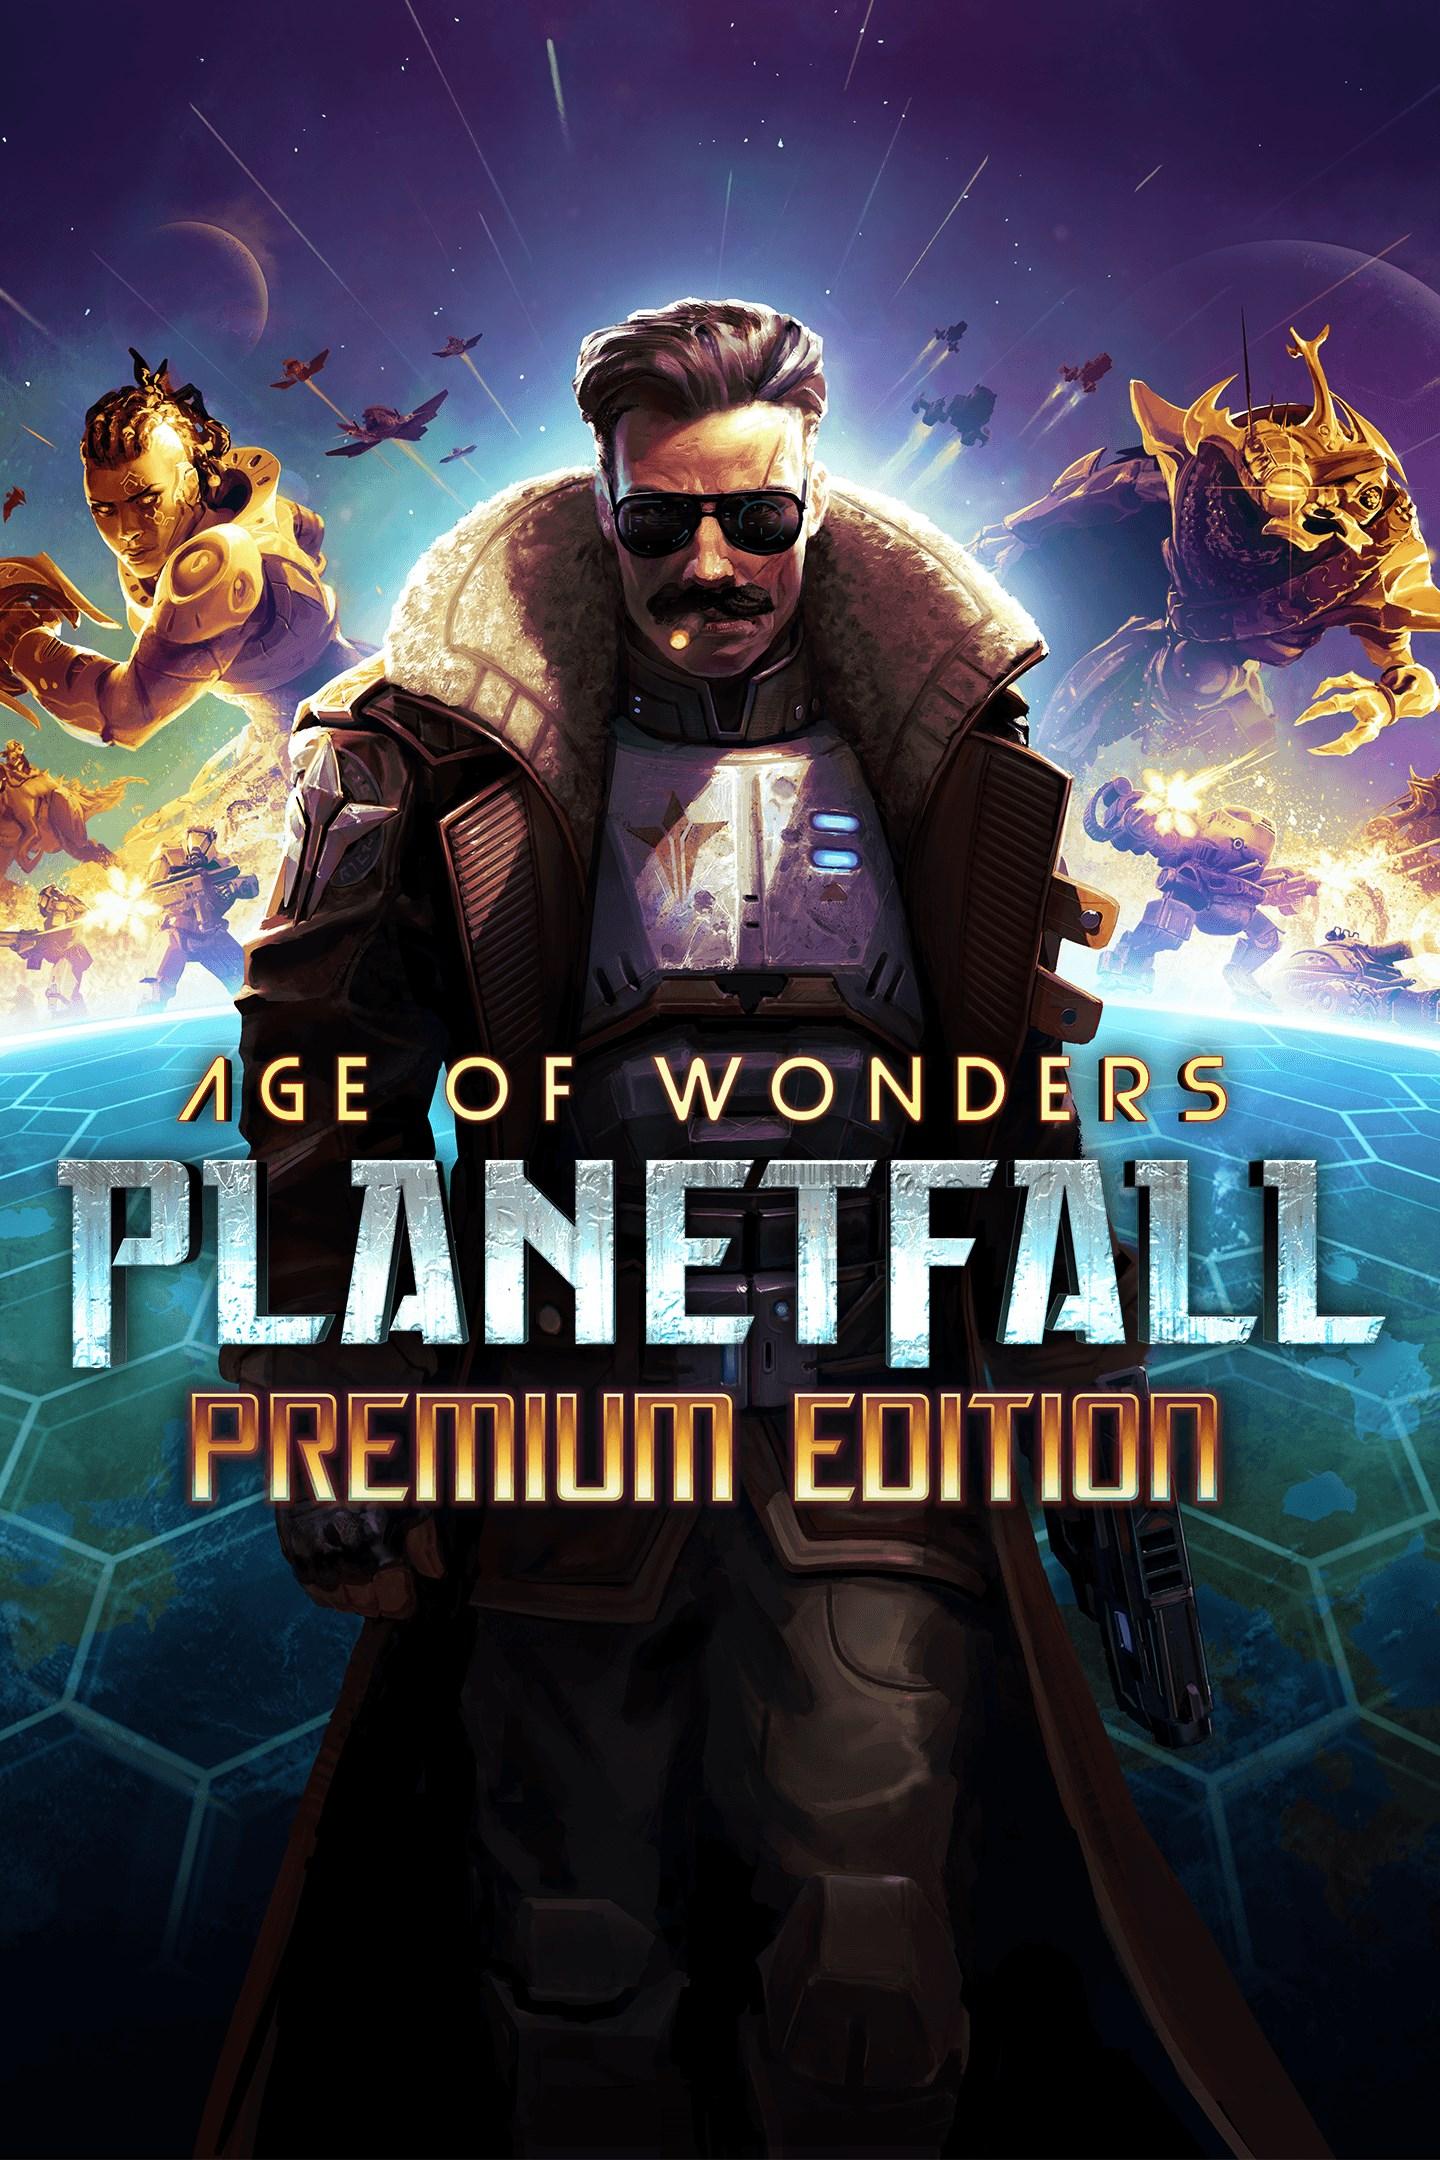 Age of Wonders: Planetfall - Premium Edition | License